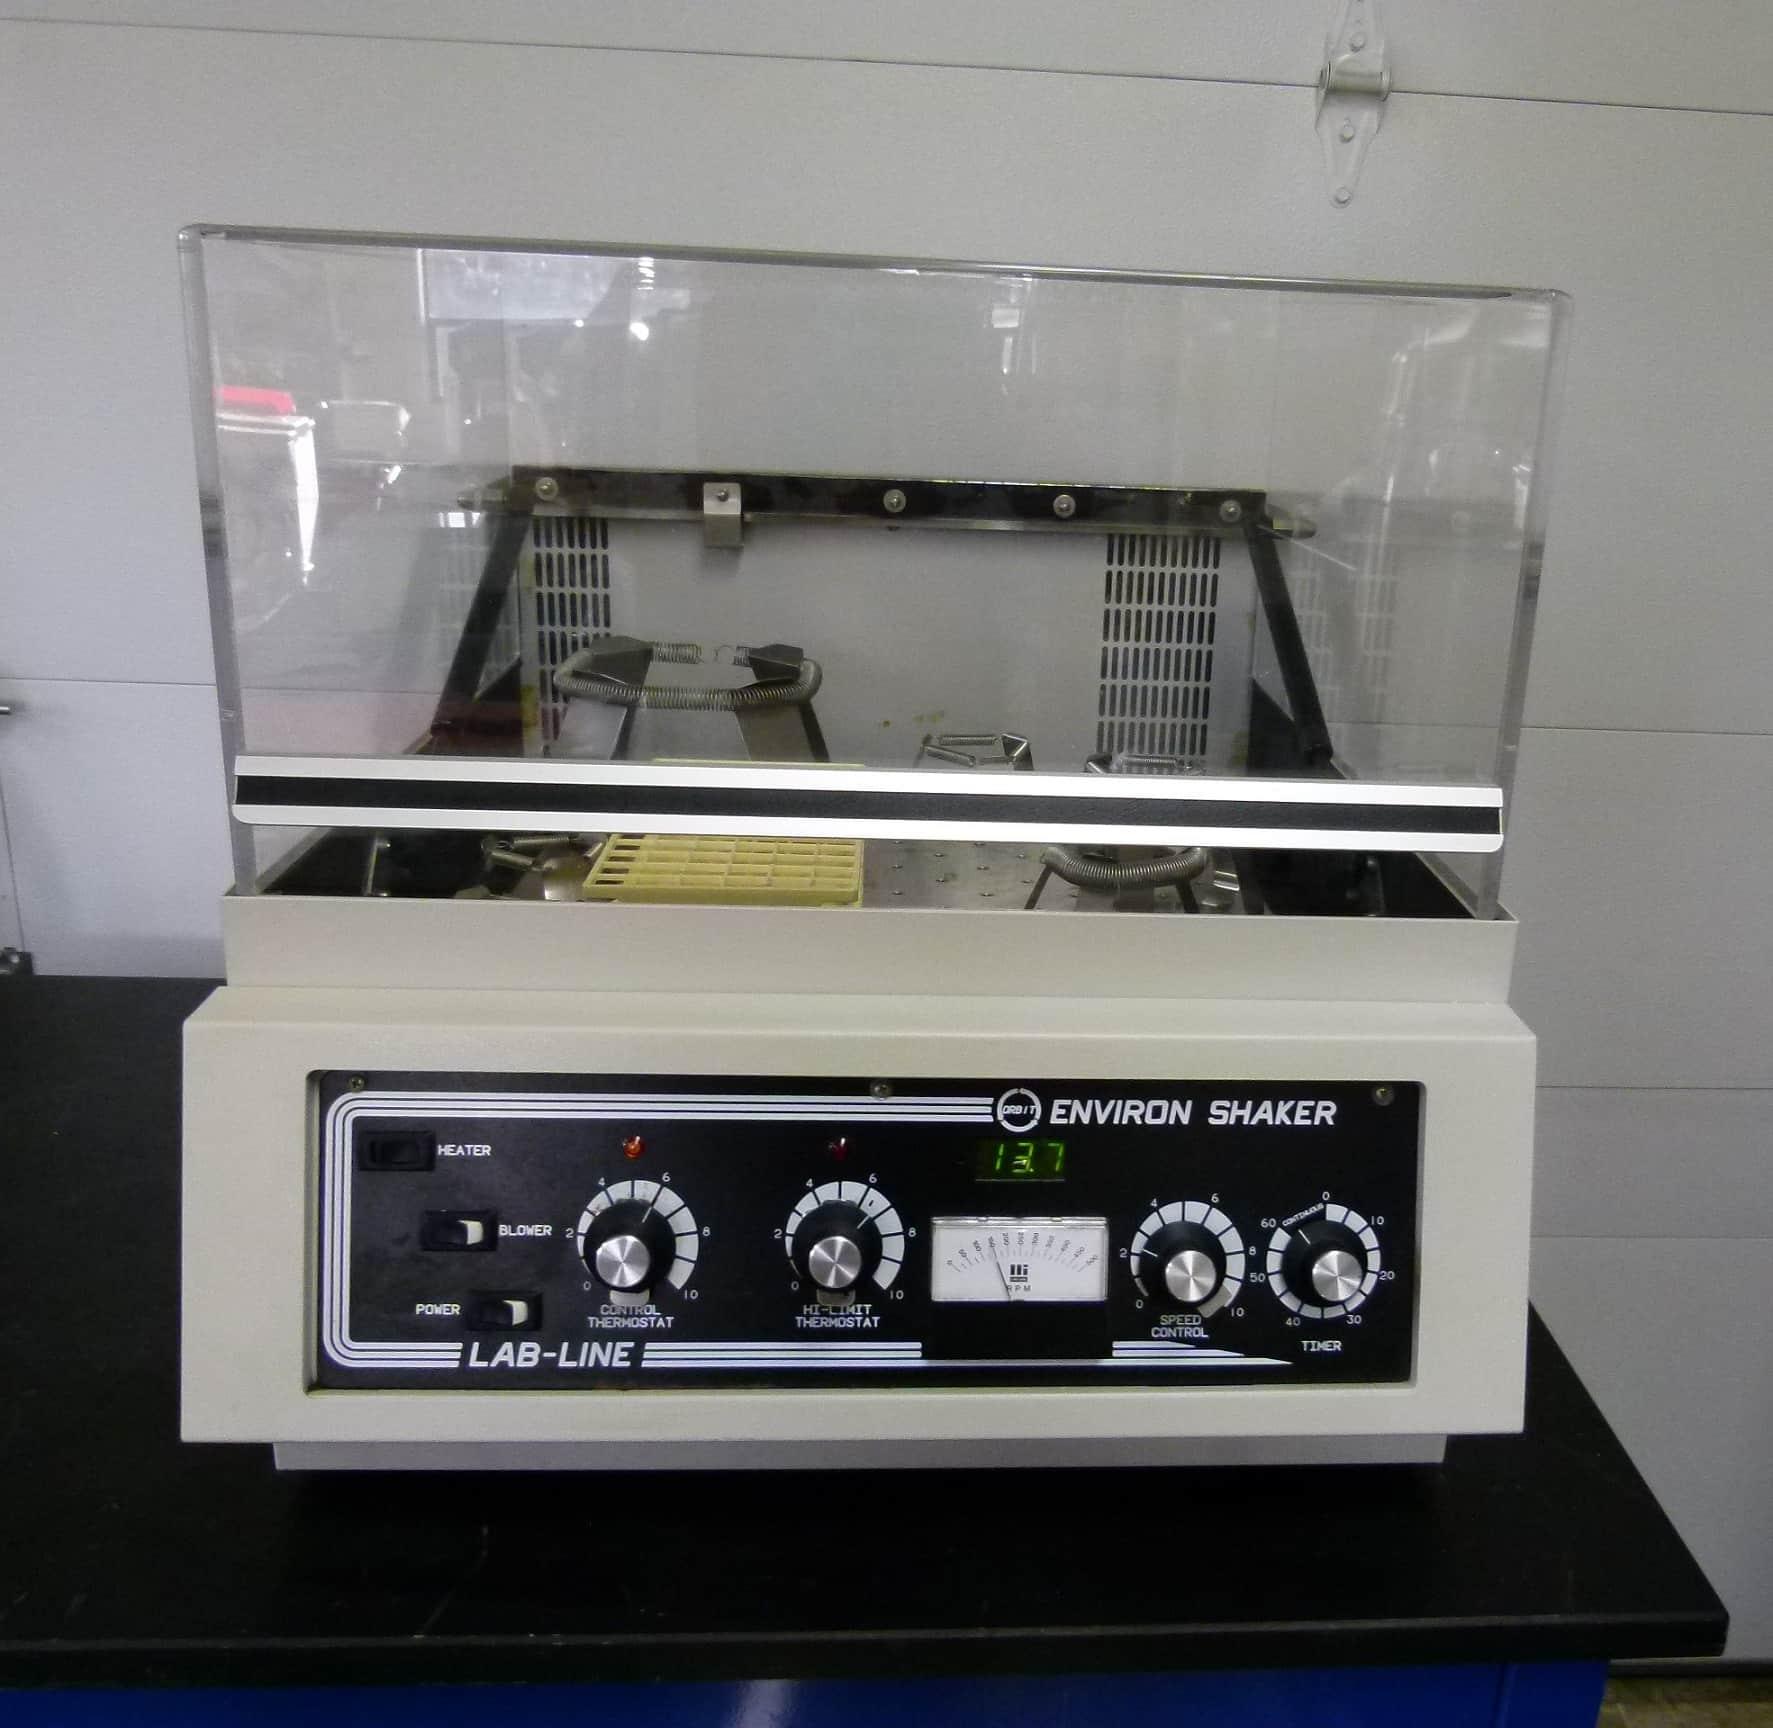 Lab-Line Environ Orbital Model 3528 Shaker